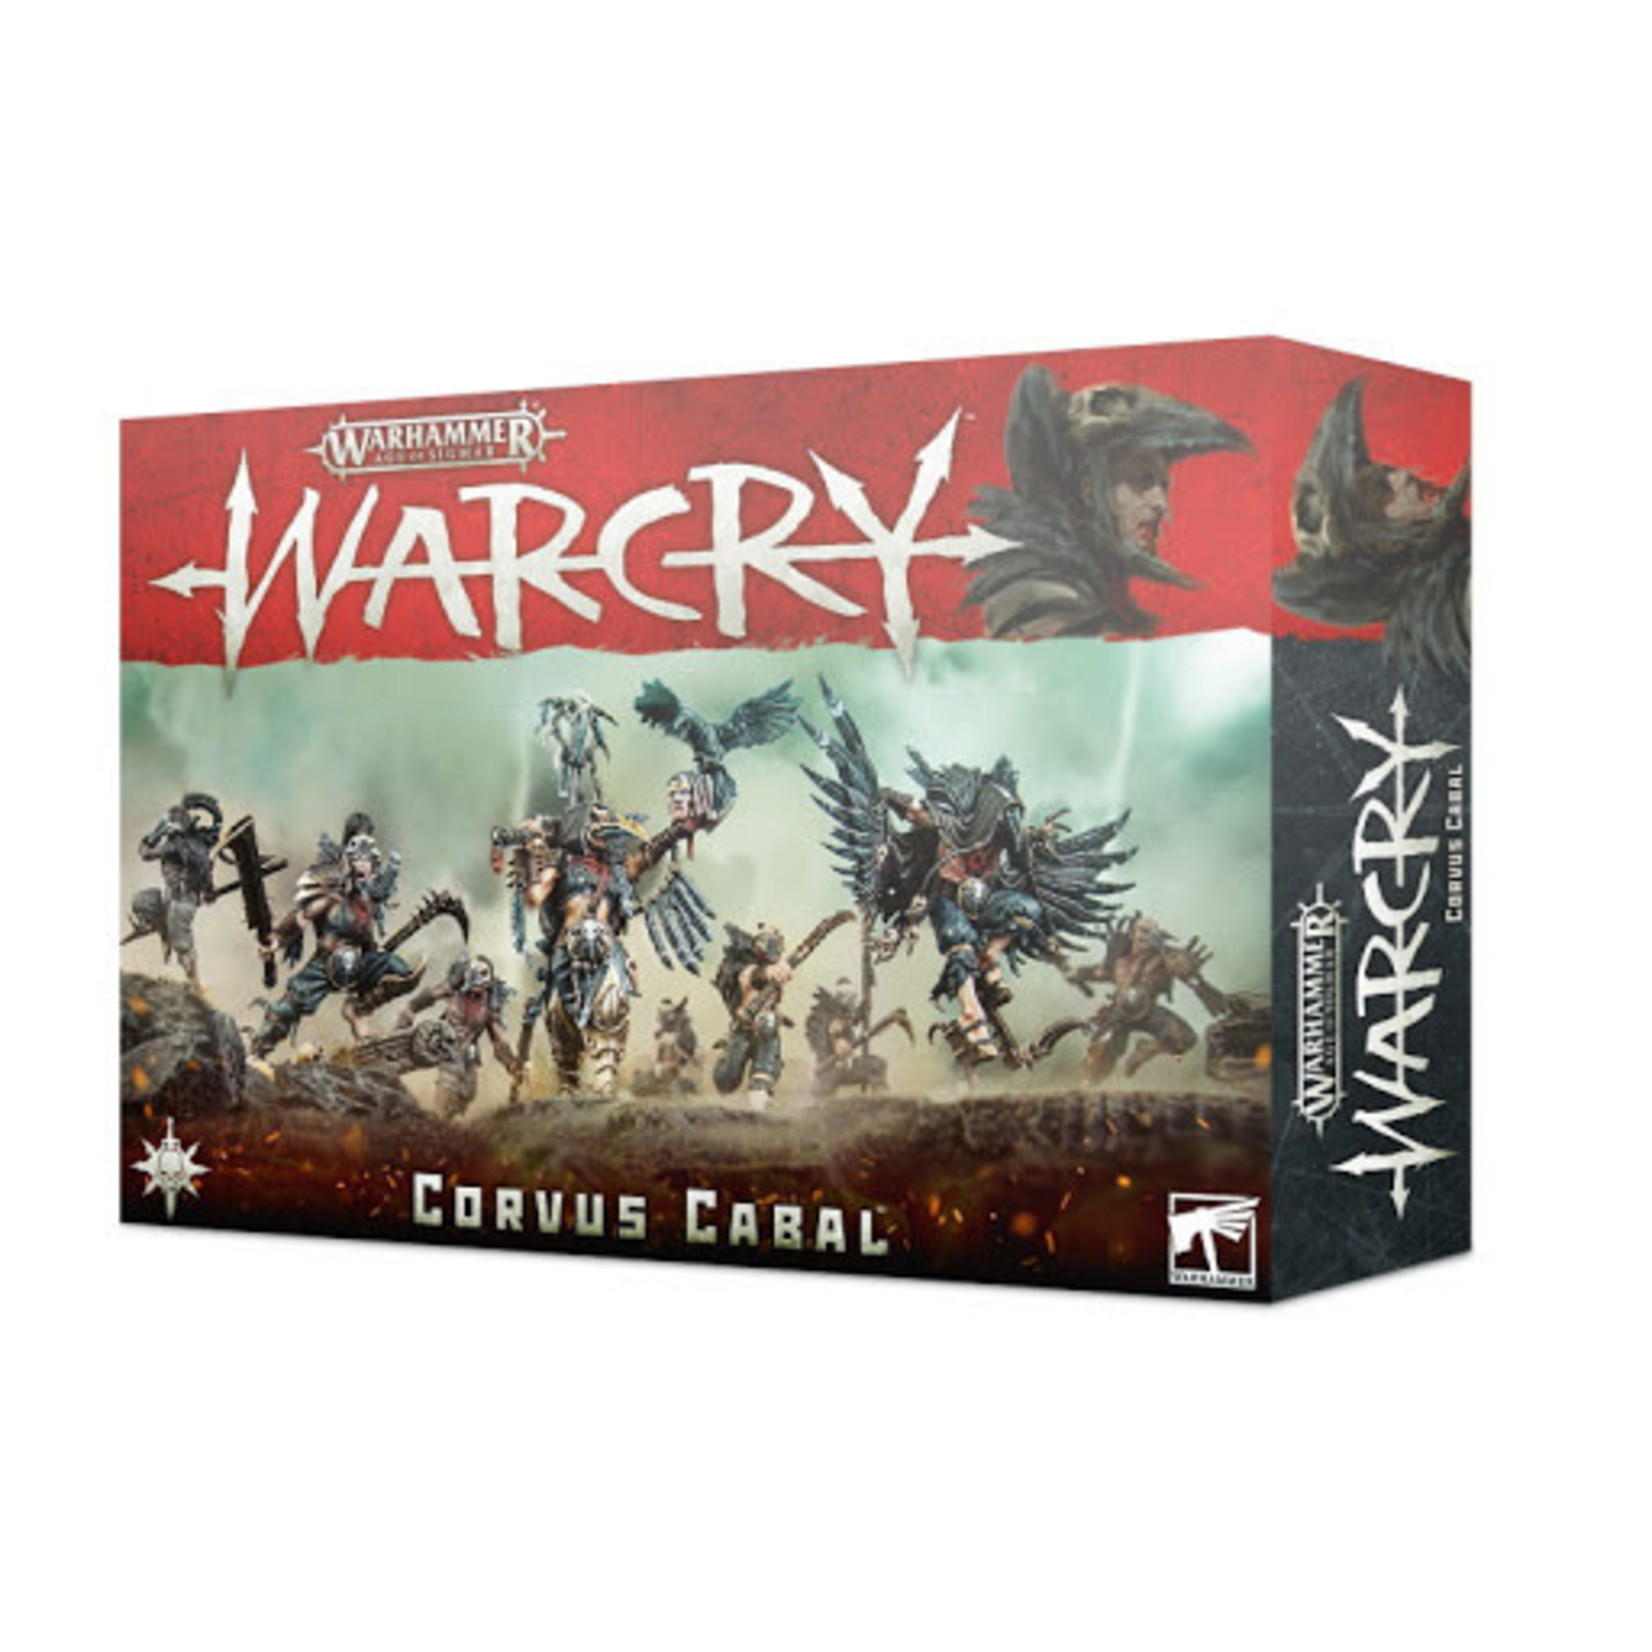 Games Workshop Warhammer Age of Sigmar: Warcry: Corvus Cabal